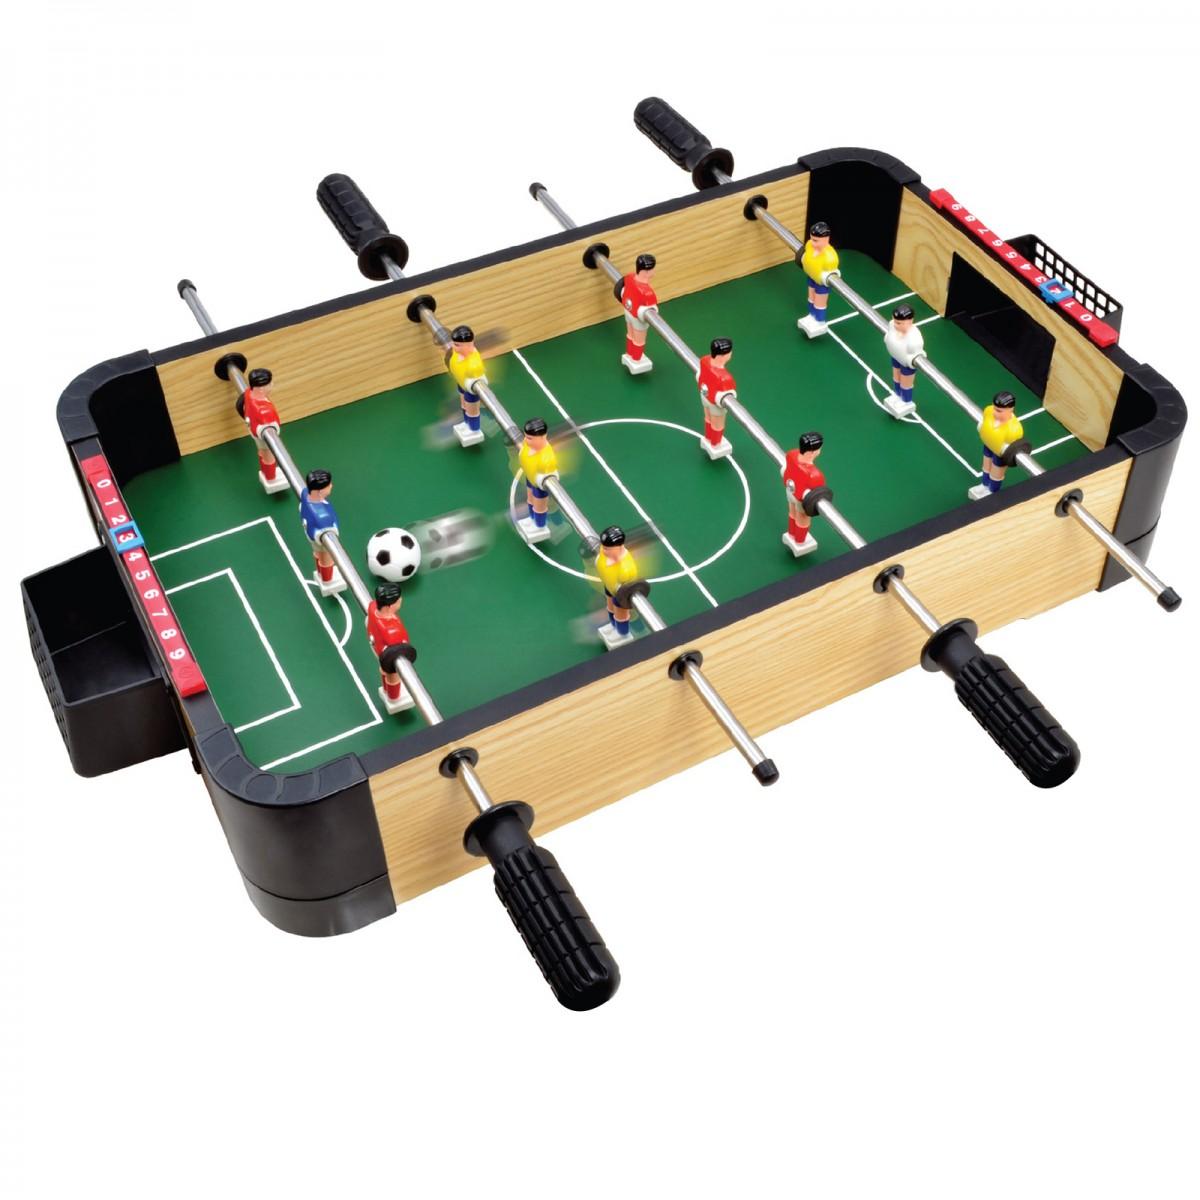 20 50cm Wood Tabletop Football Foosball Soccer Games Tables